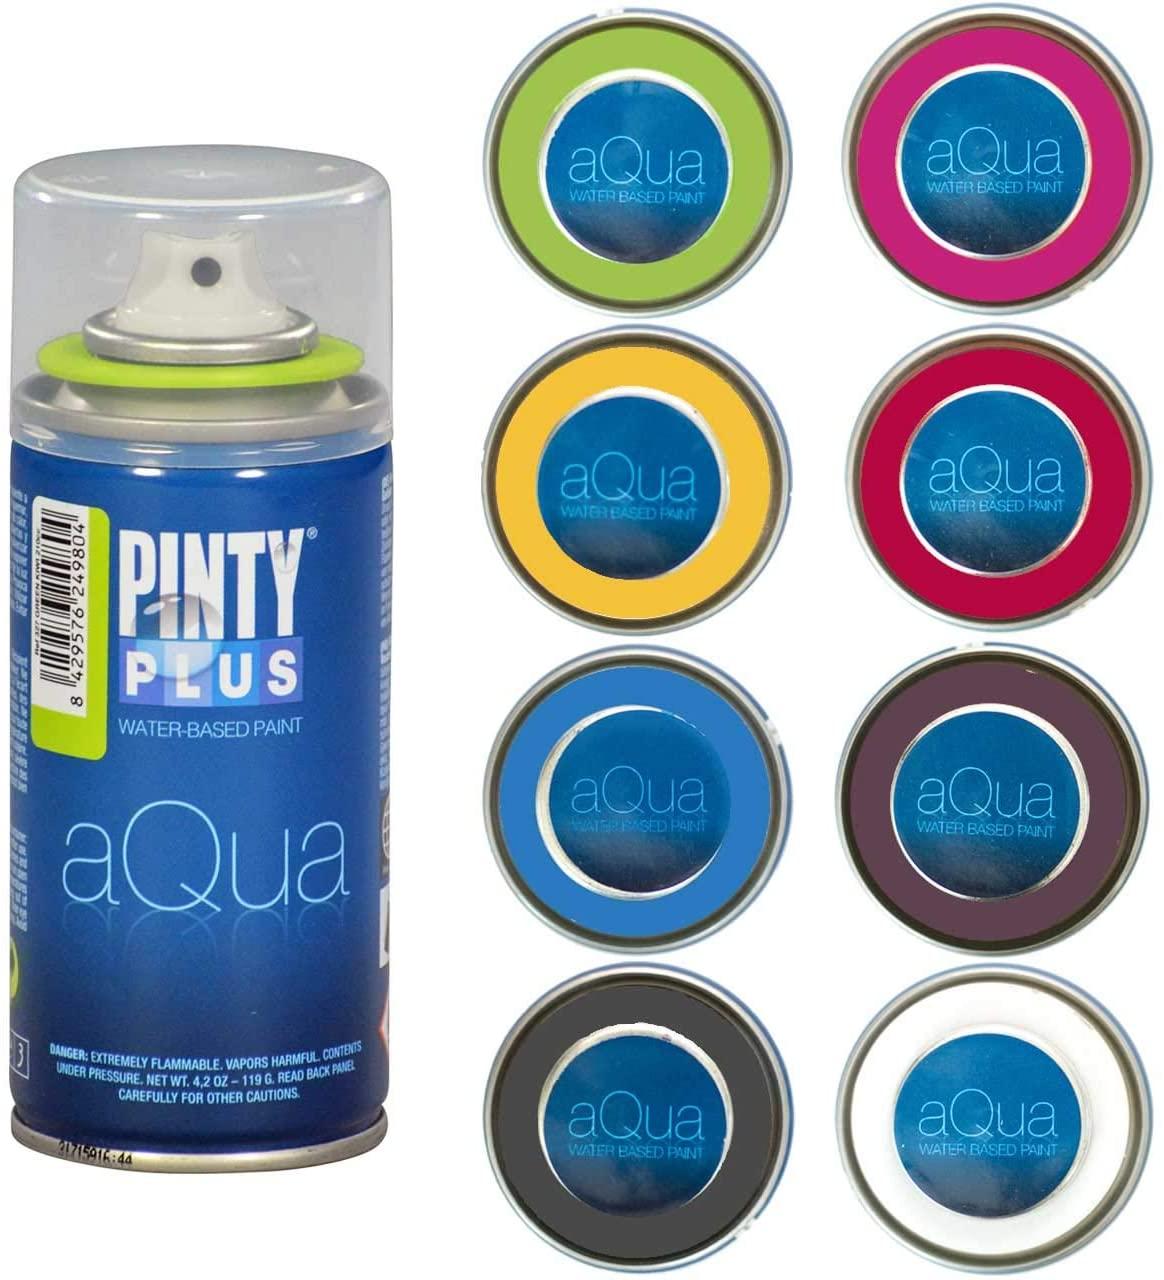 Pintyplus-Aqua-Spray-Paint